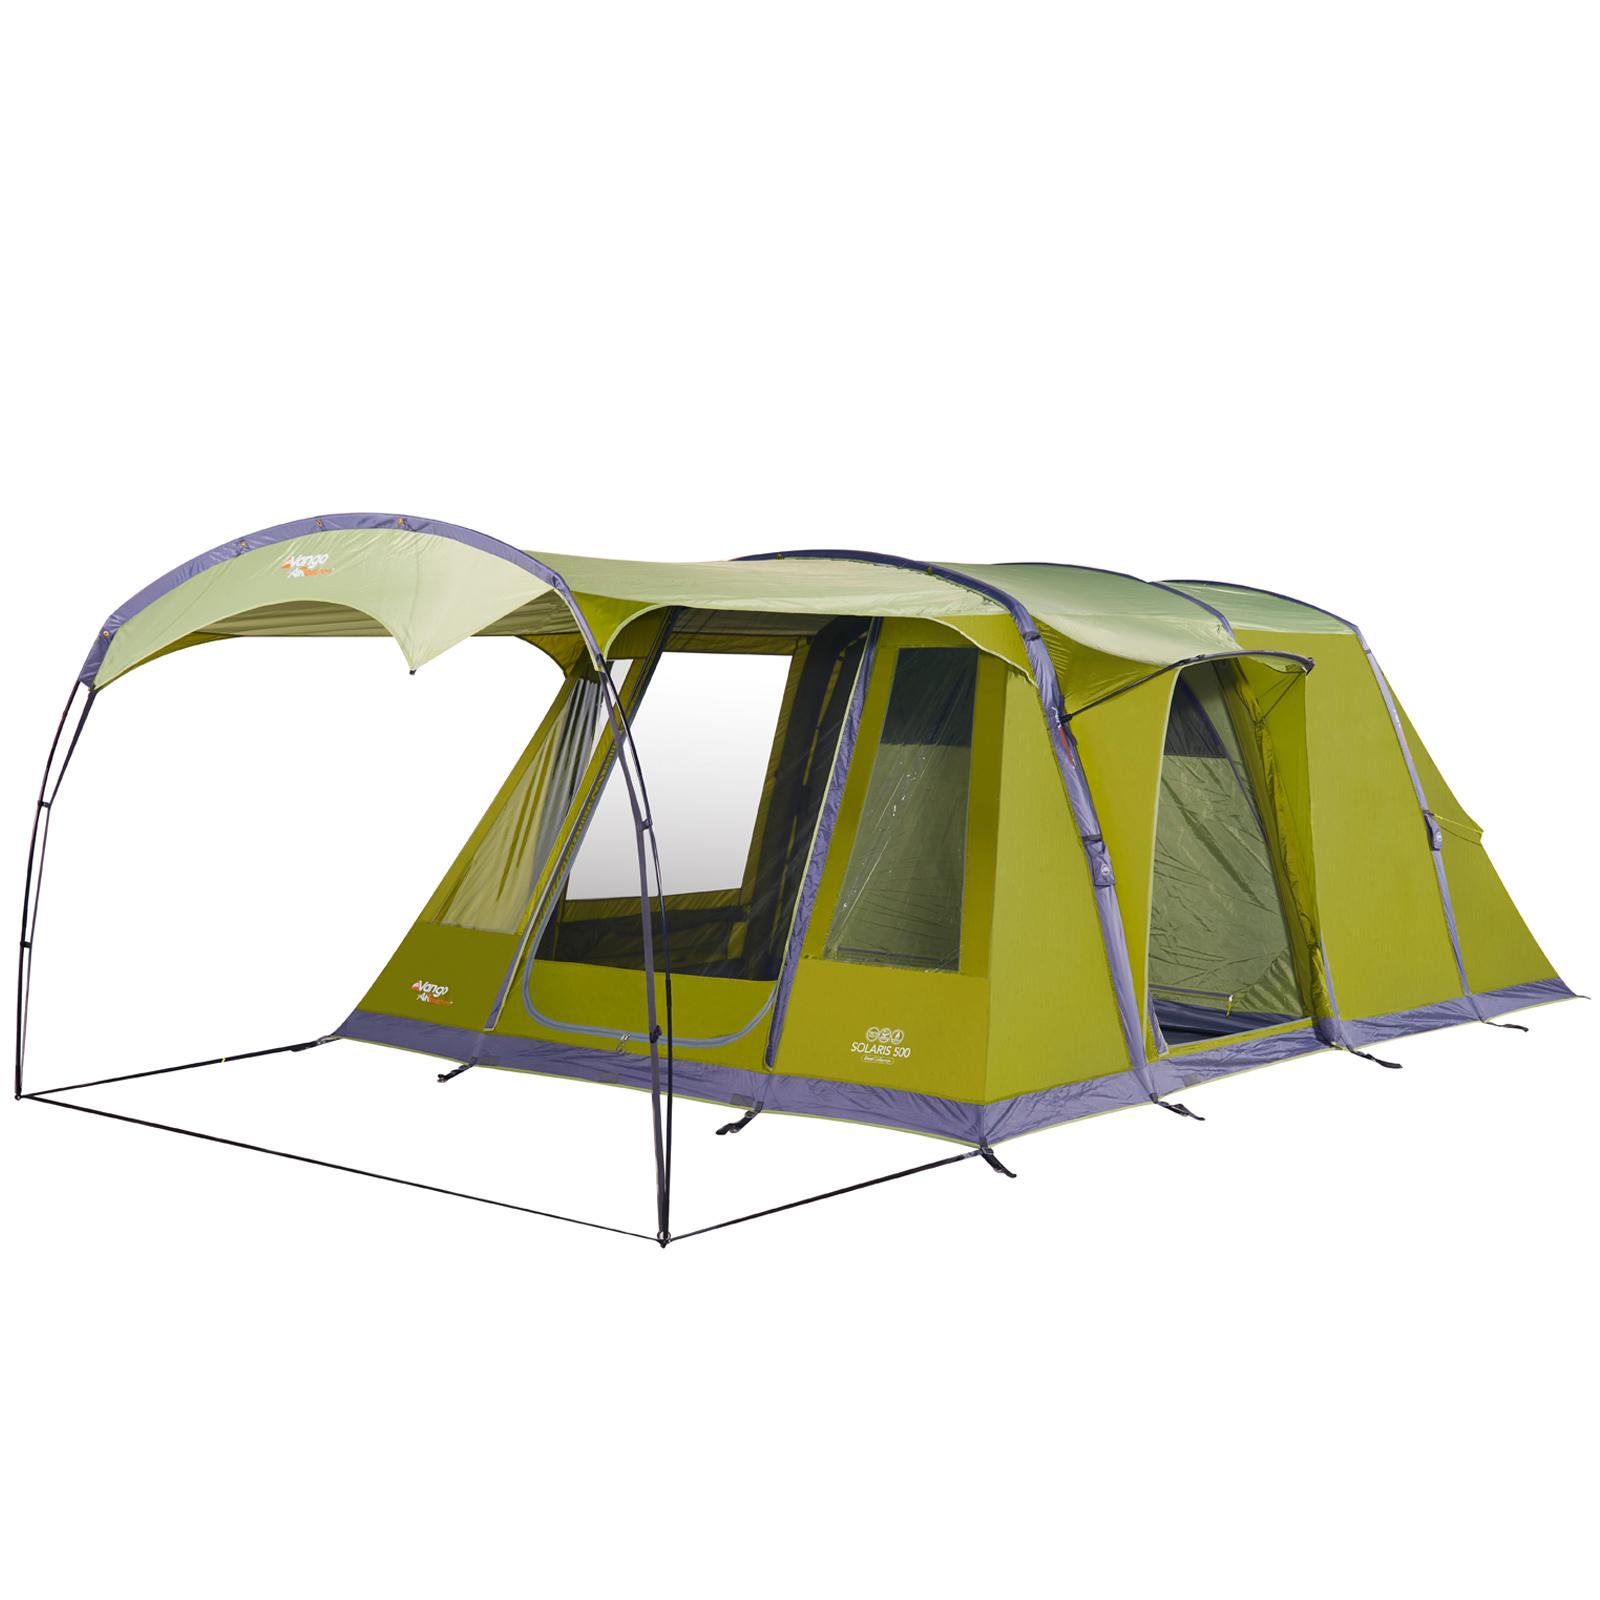 Zelt Explorer 4 : Explorer luft zelt alegra air personen camping familien